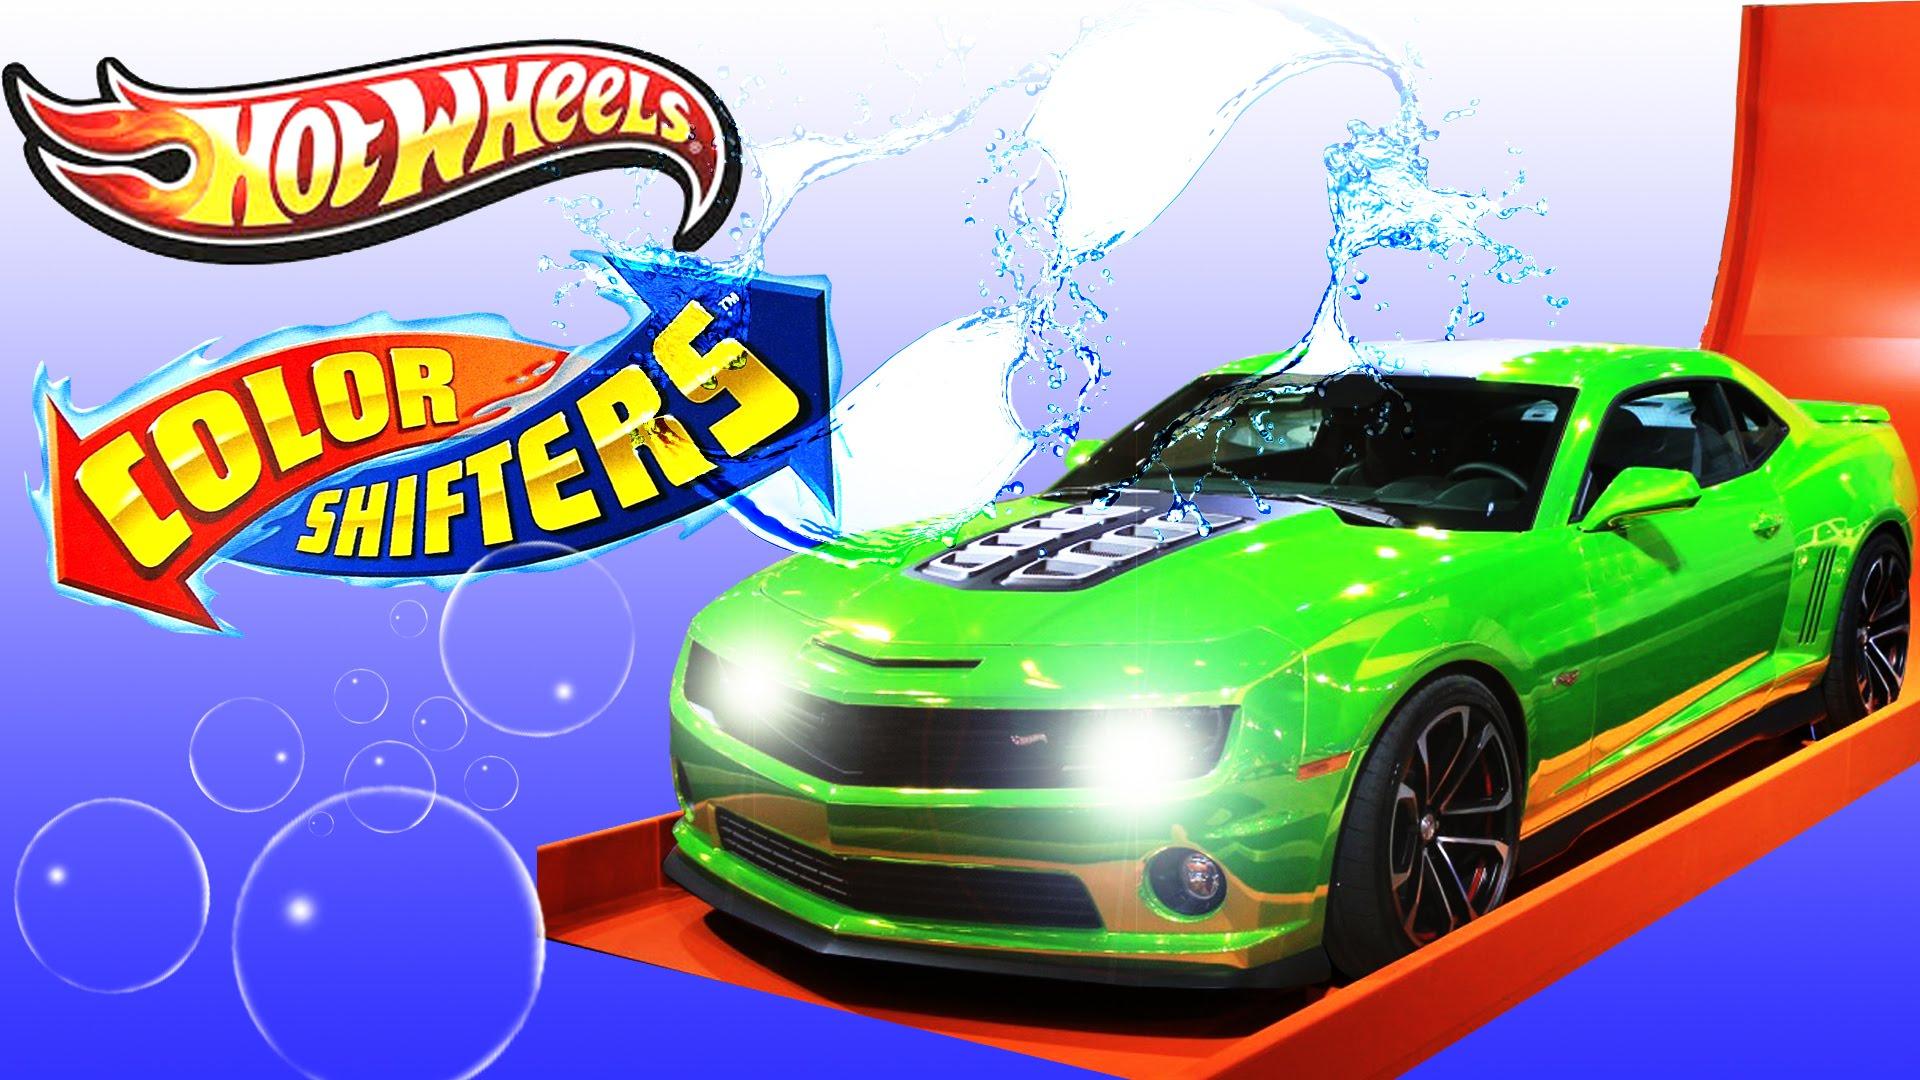 Drawn truck hot wheel car N new color Hot bubbles